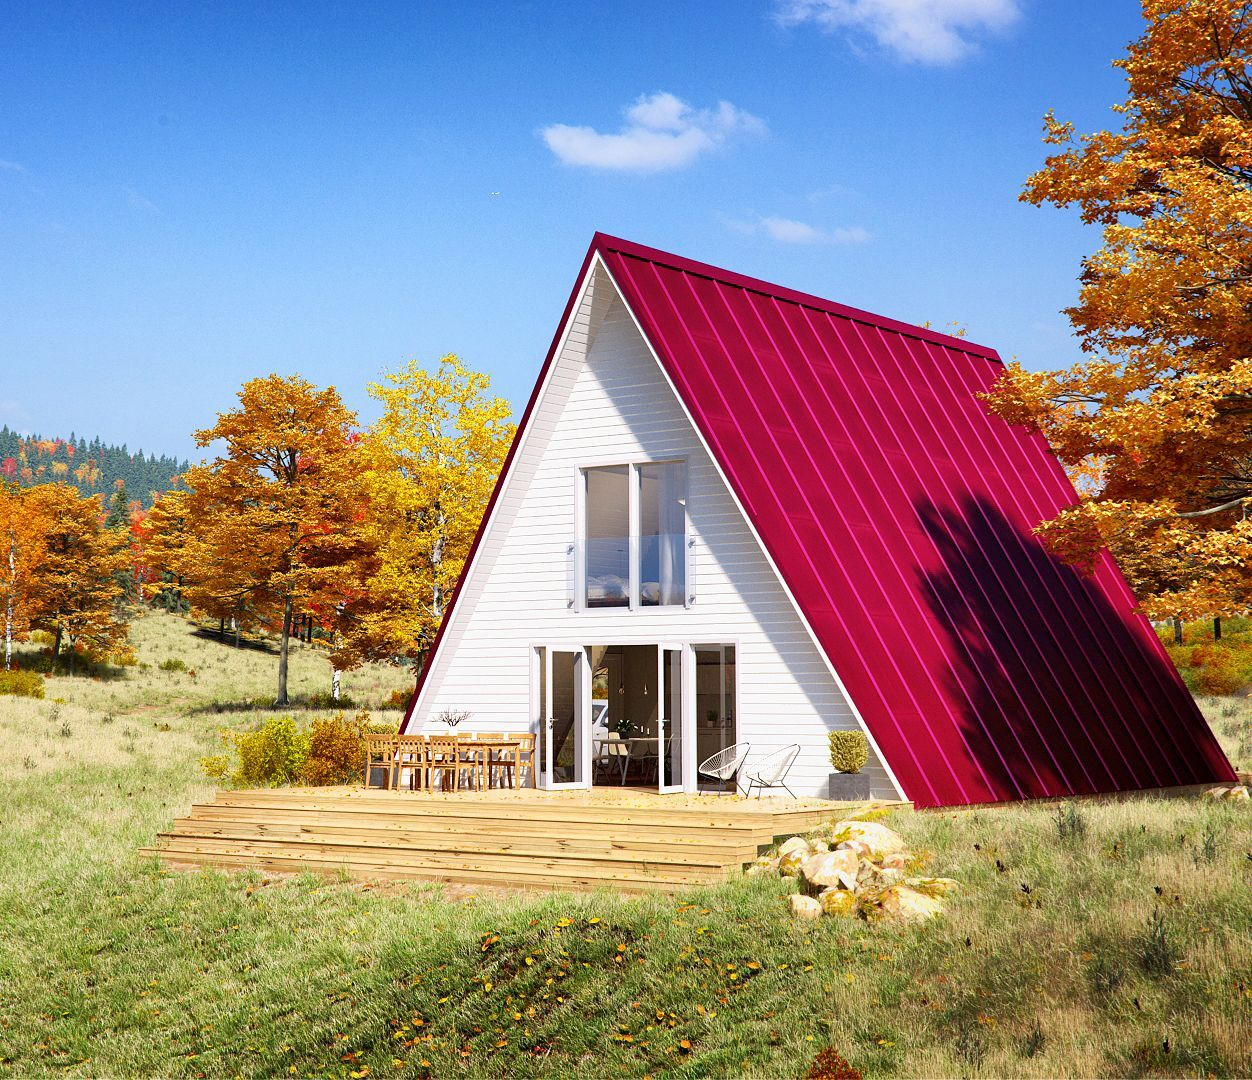 Affordable Housing With A Frame Kit Homes Bungalovlar Cerceve